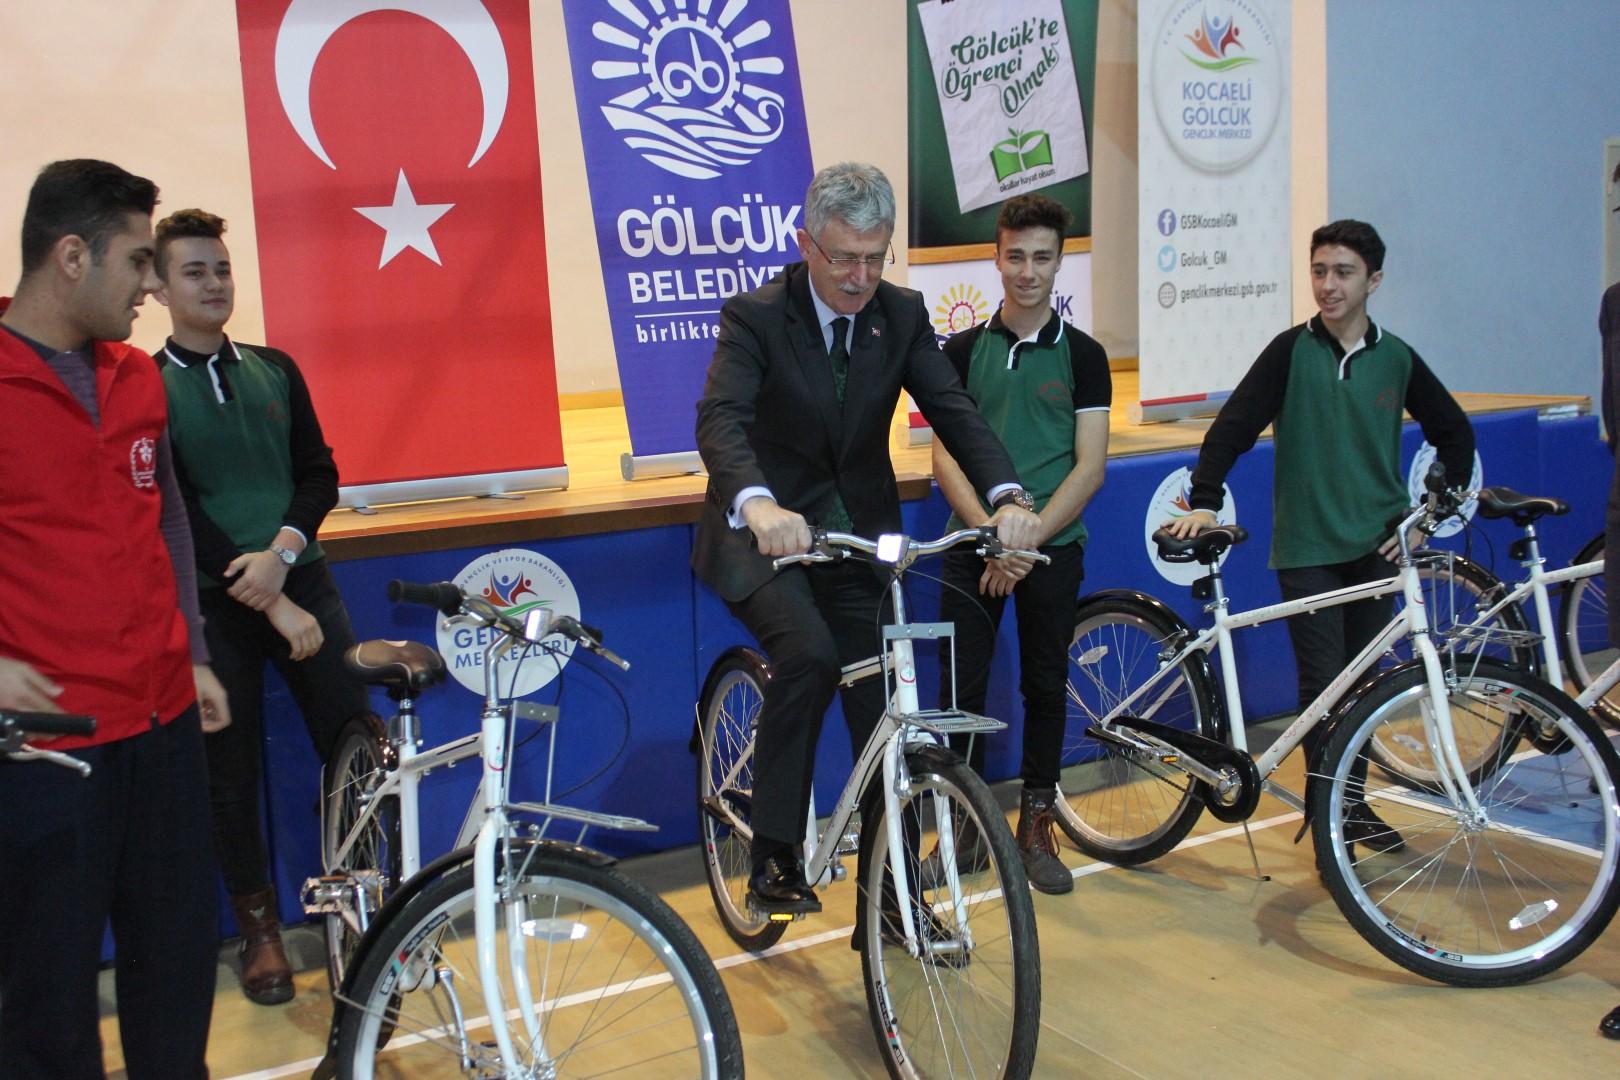 Başkandan 10 bisiklet